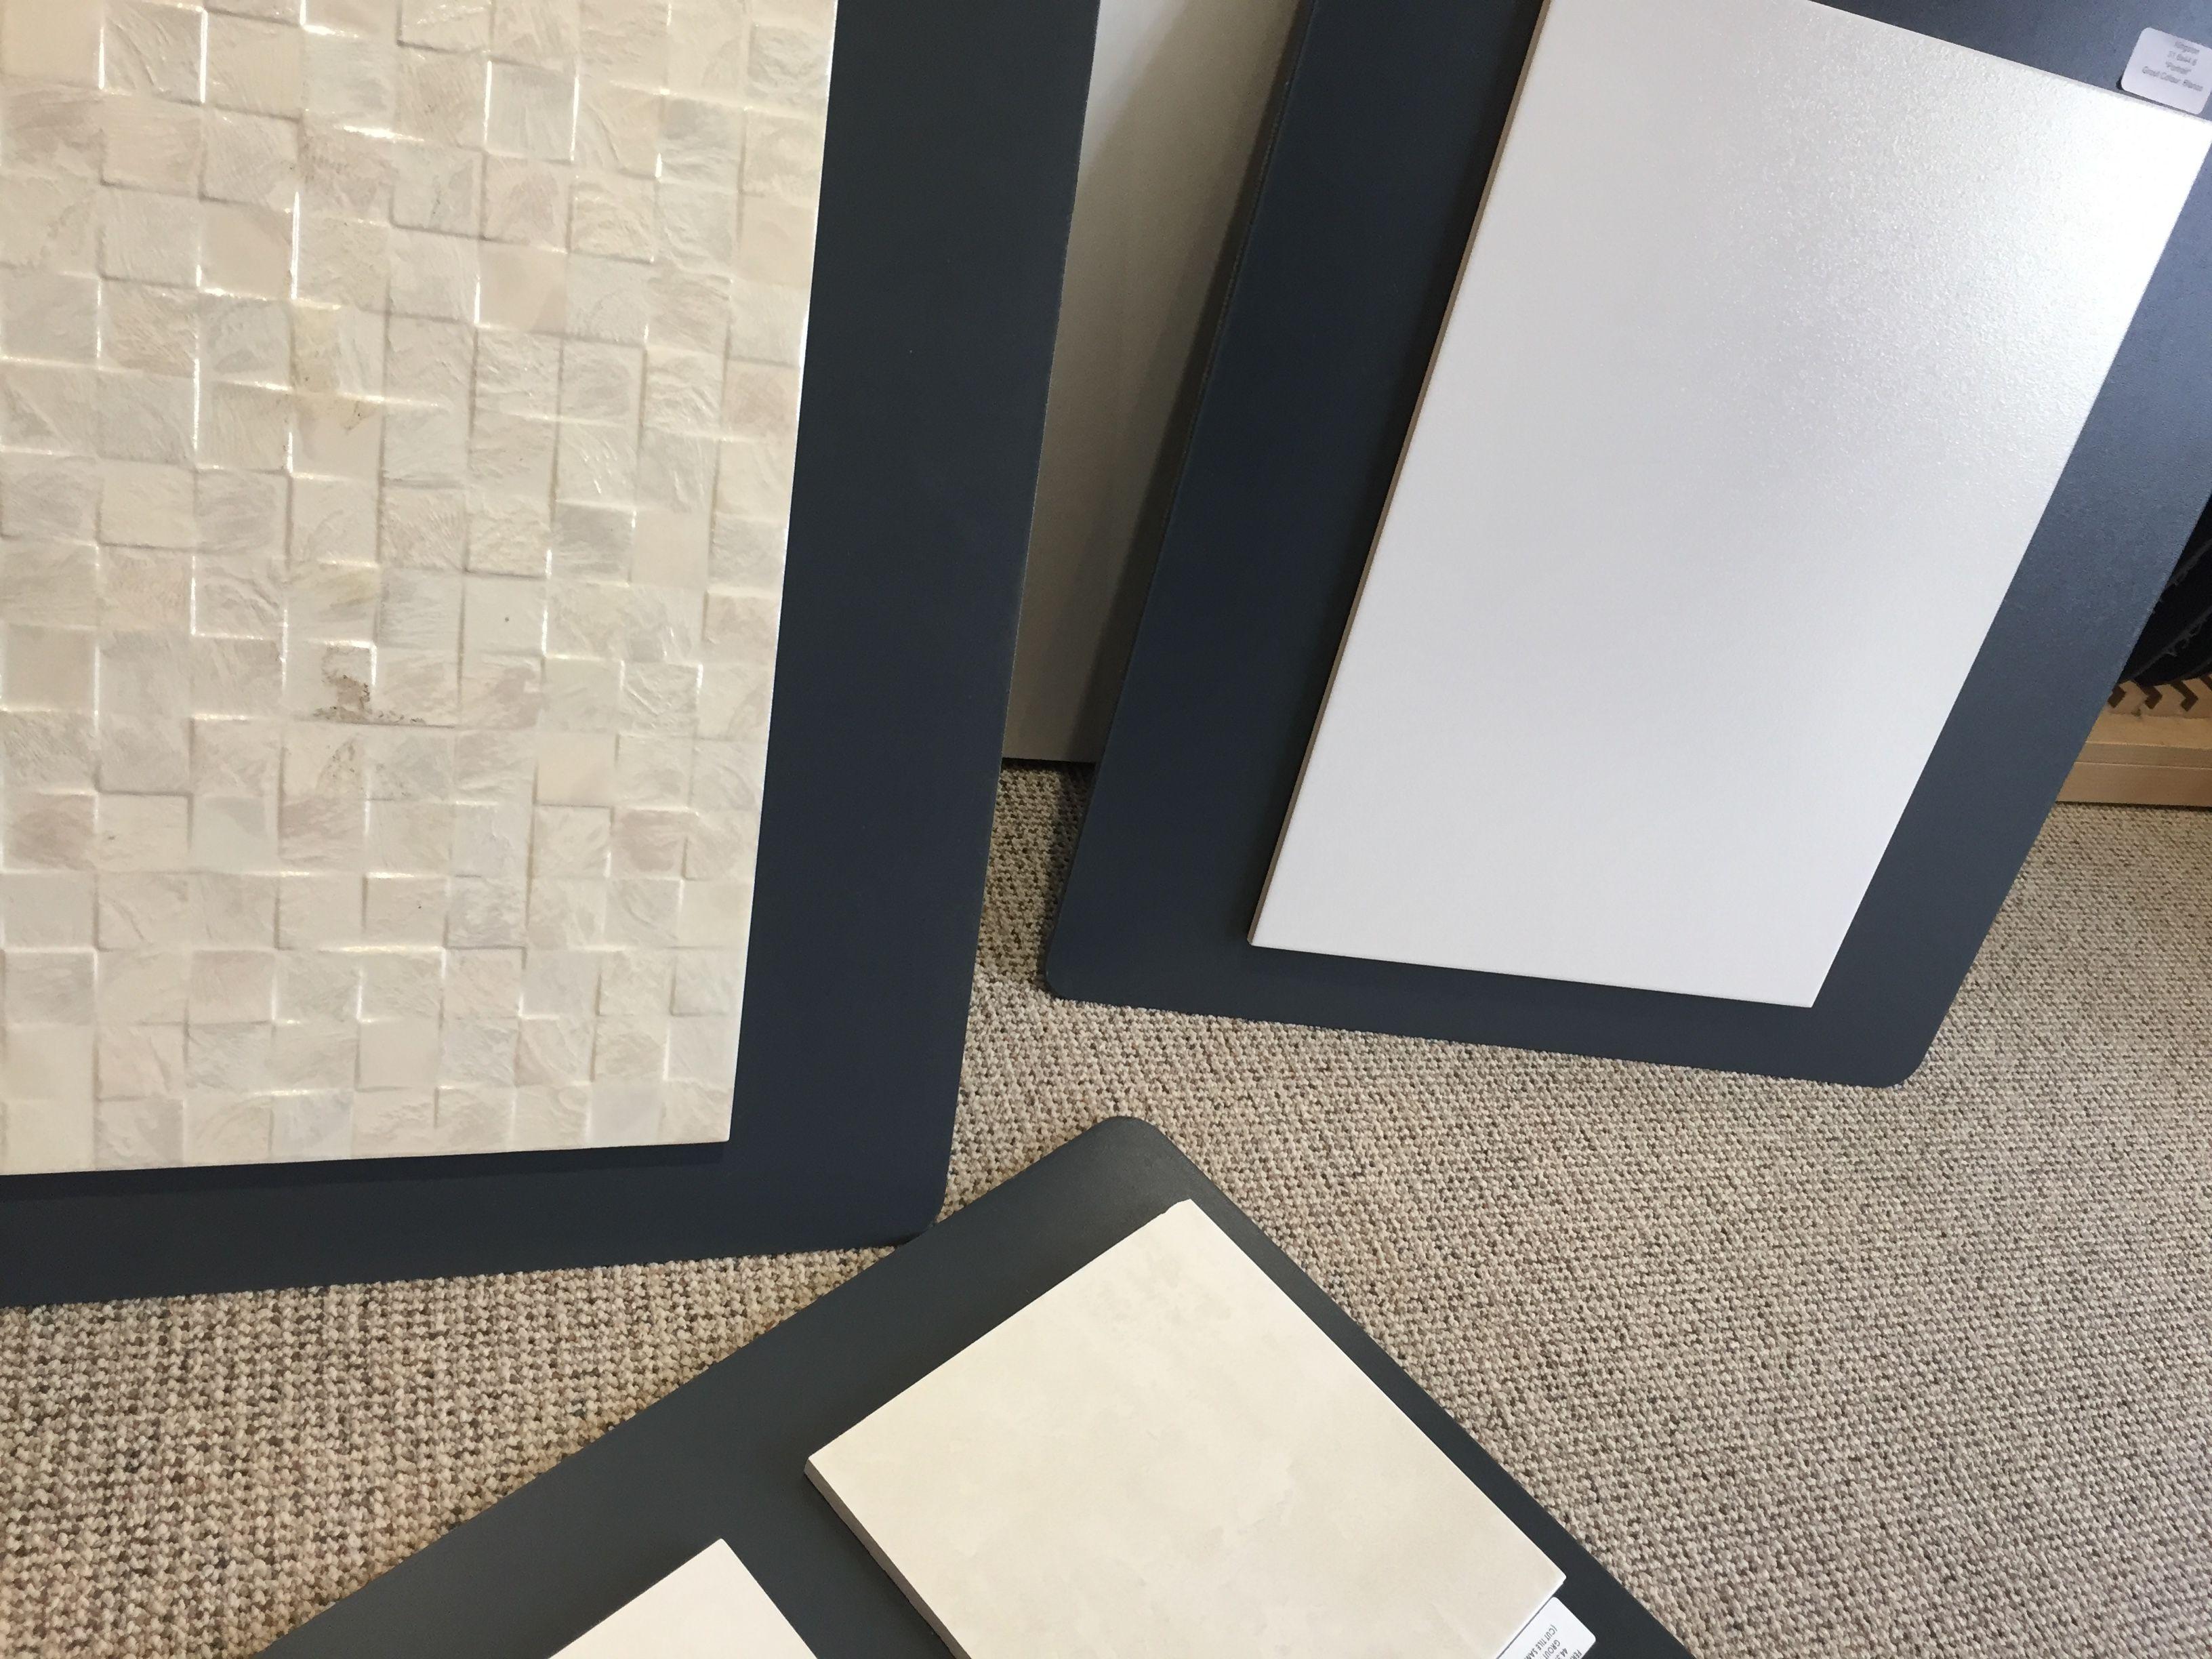 Bathroom Tiles Redditch taylor wimpey bathroom tiles | new home | pinterest | bathroom tiling